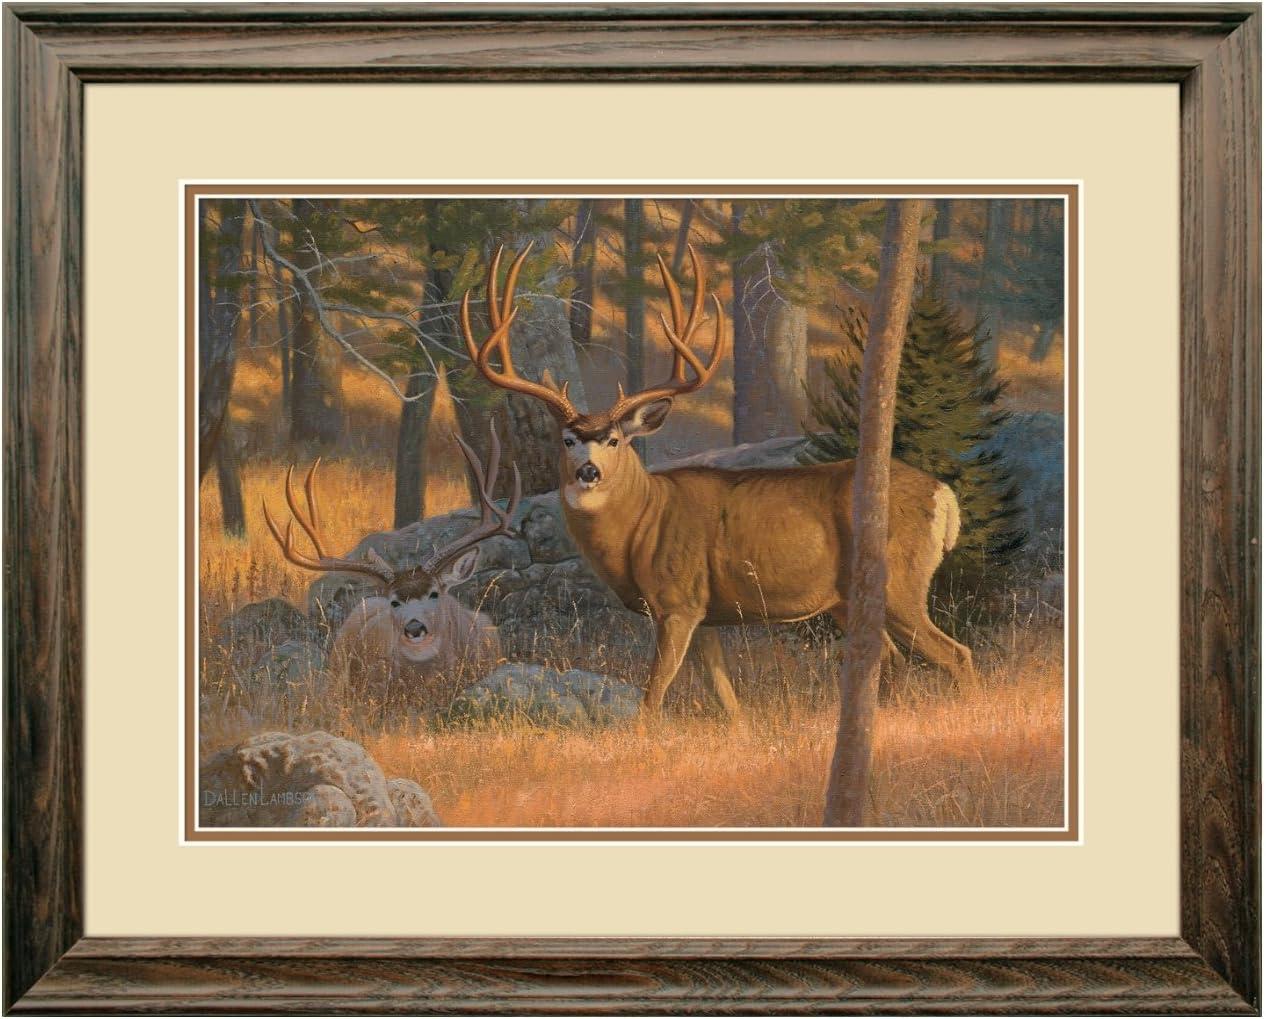 Reflective Art, The Bachelor Pad, Dark Walnut Framed, 18.5 by 22.5-inch